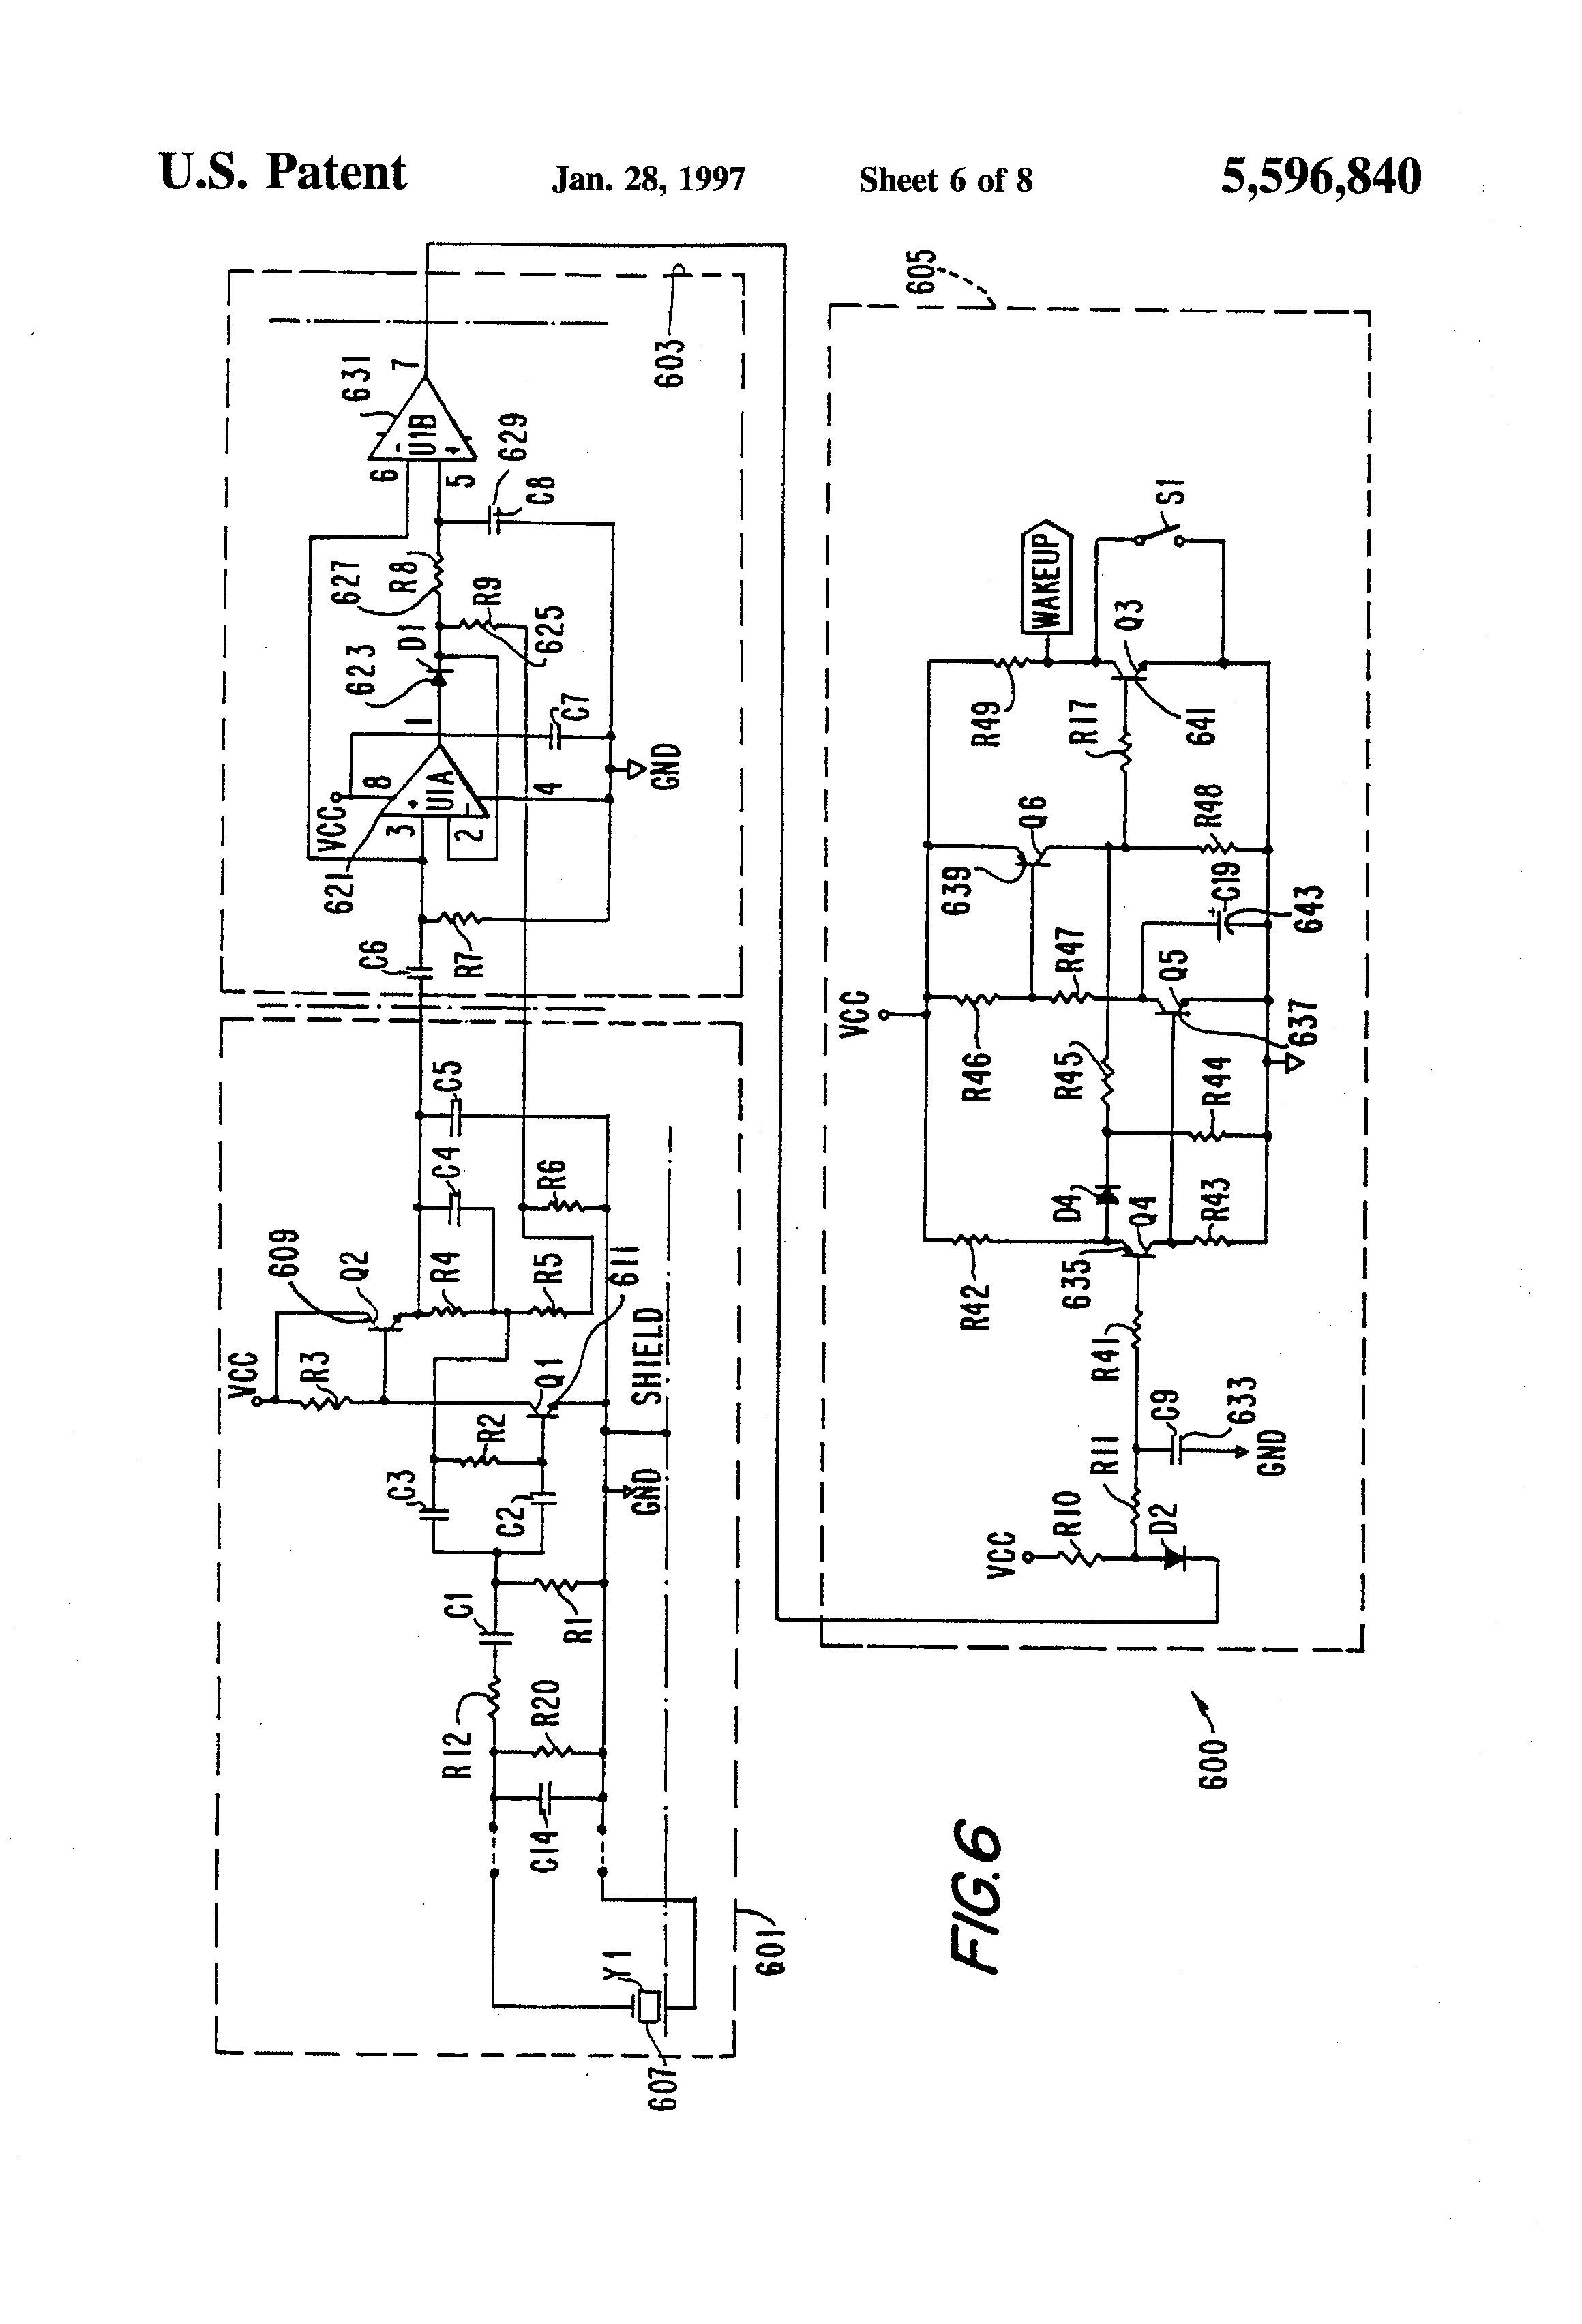 Genie Garage Door Sensor Wiring Diagram Free Picture   Manual E-Books - Genie Garage Door Sensor Wiring Diagram